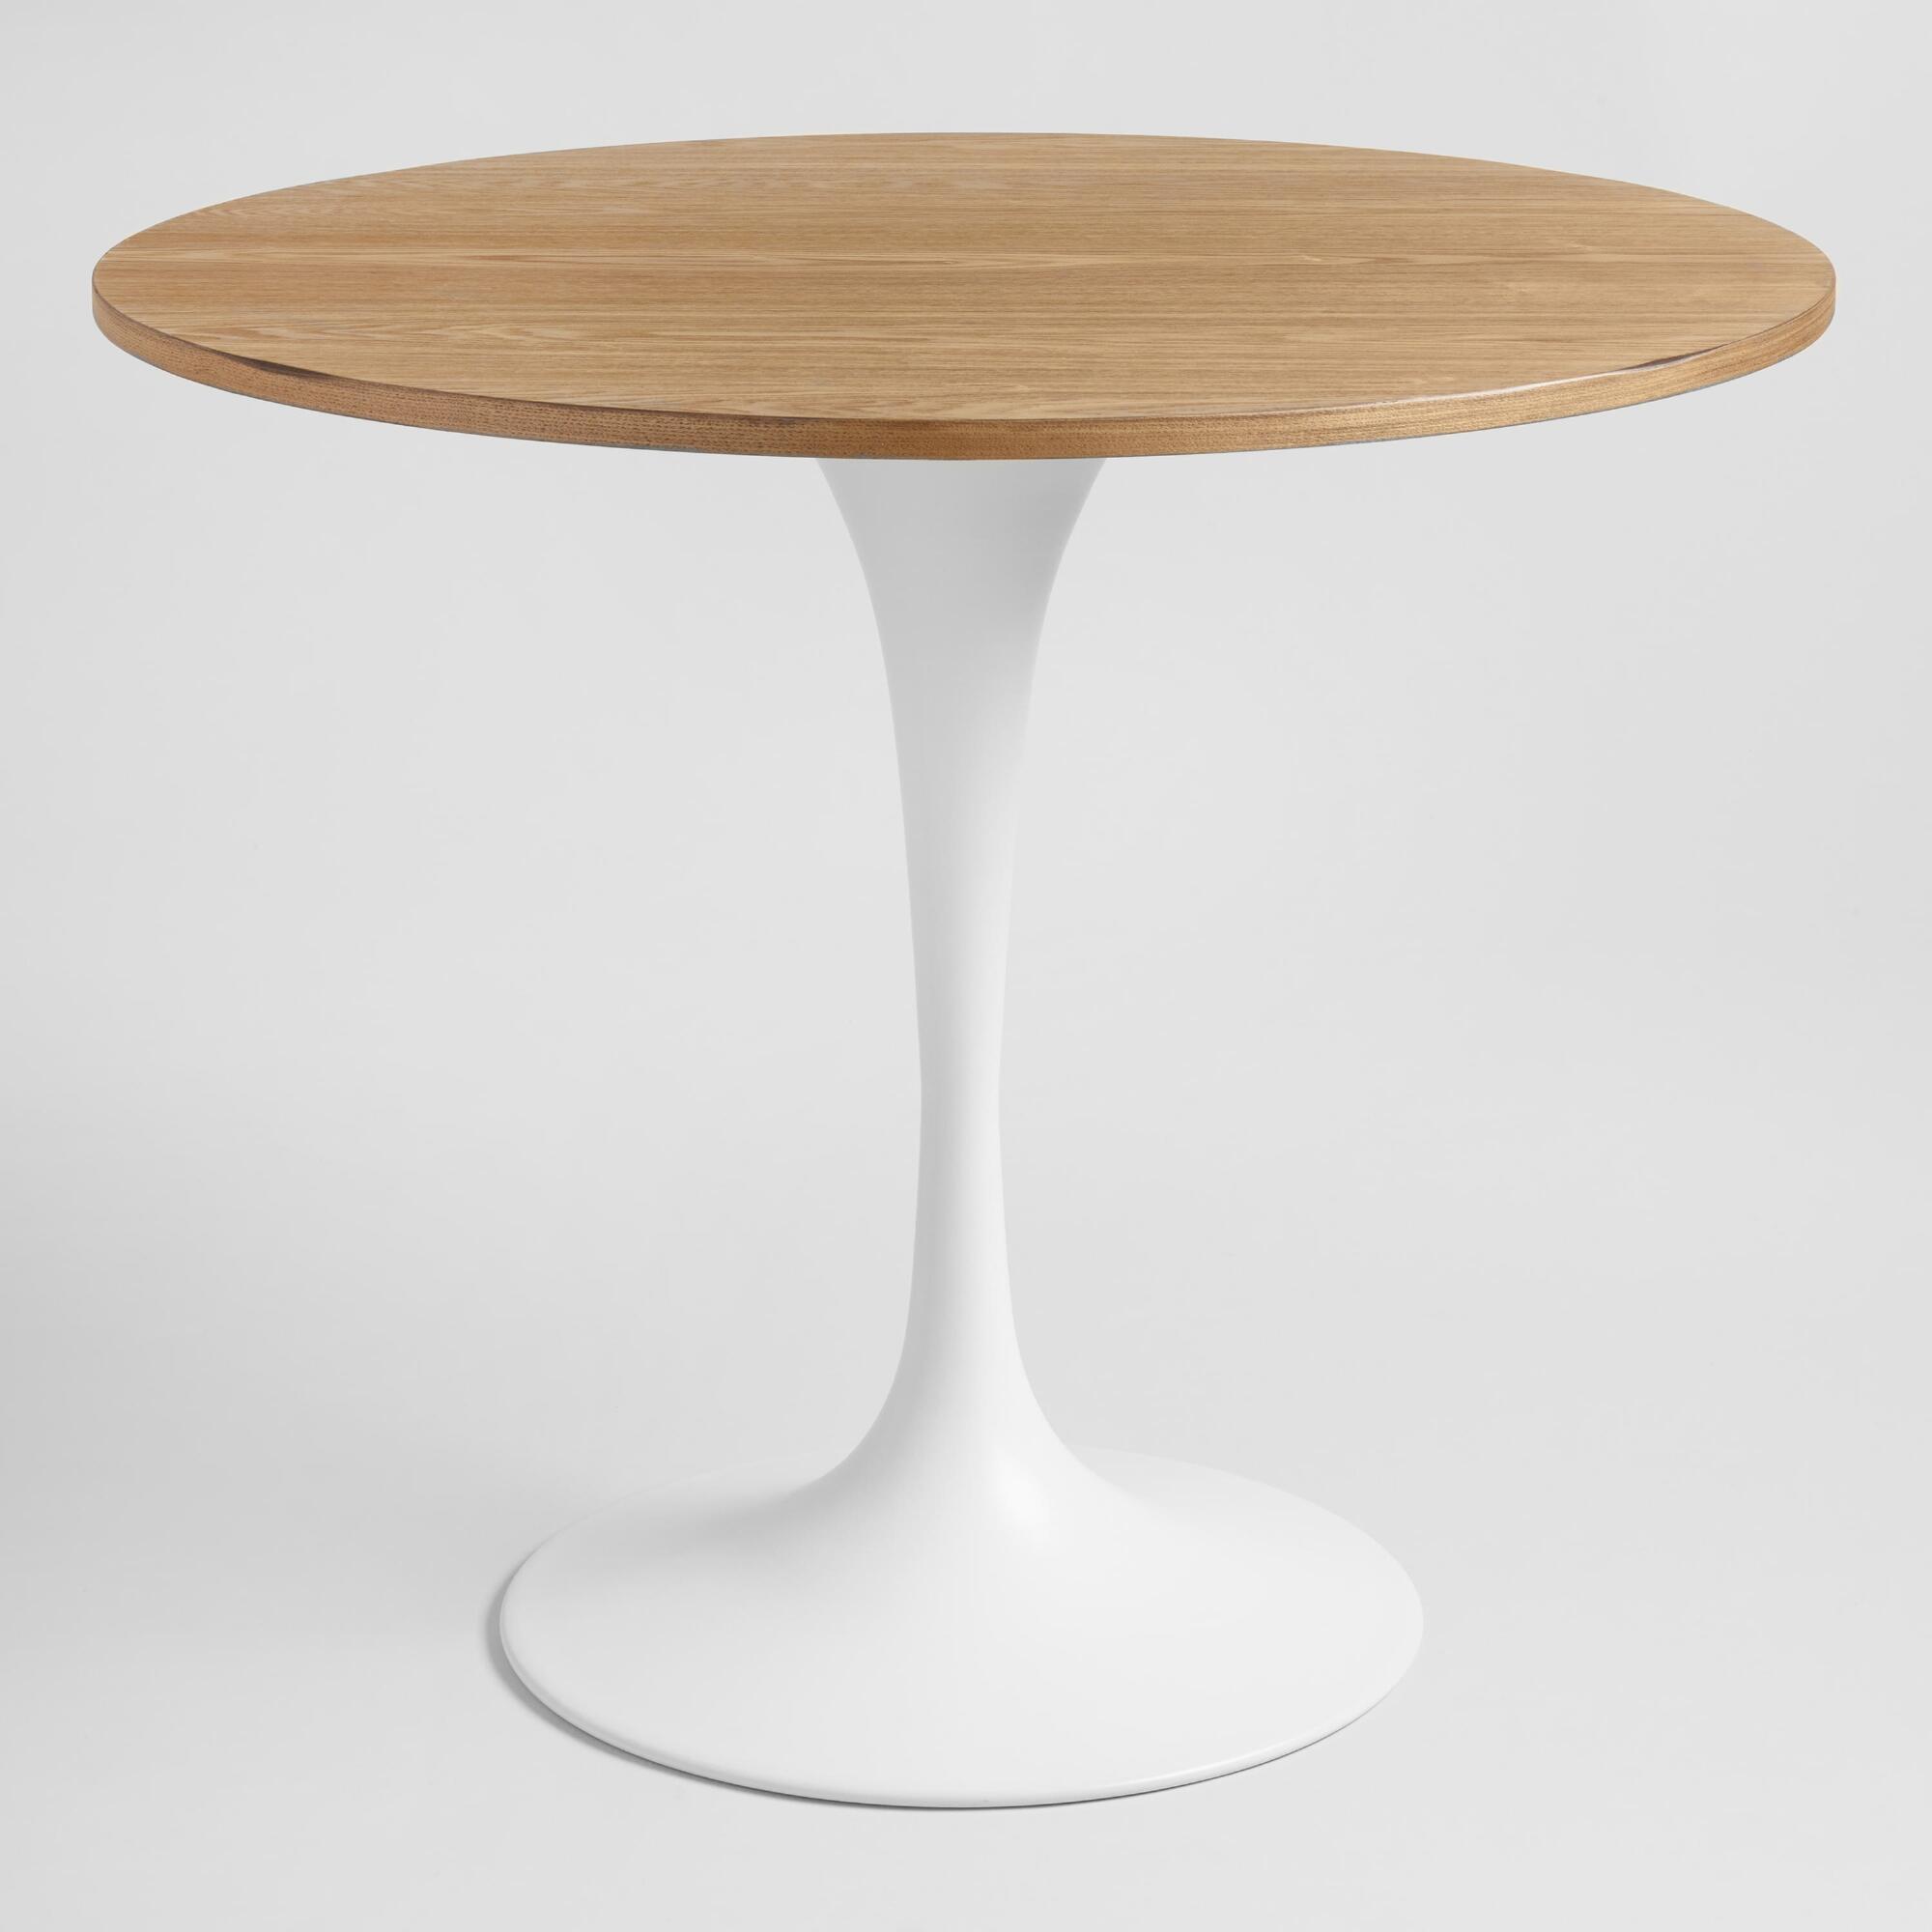 Tulip Dining Table | $249.99 ON SALE